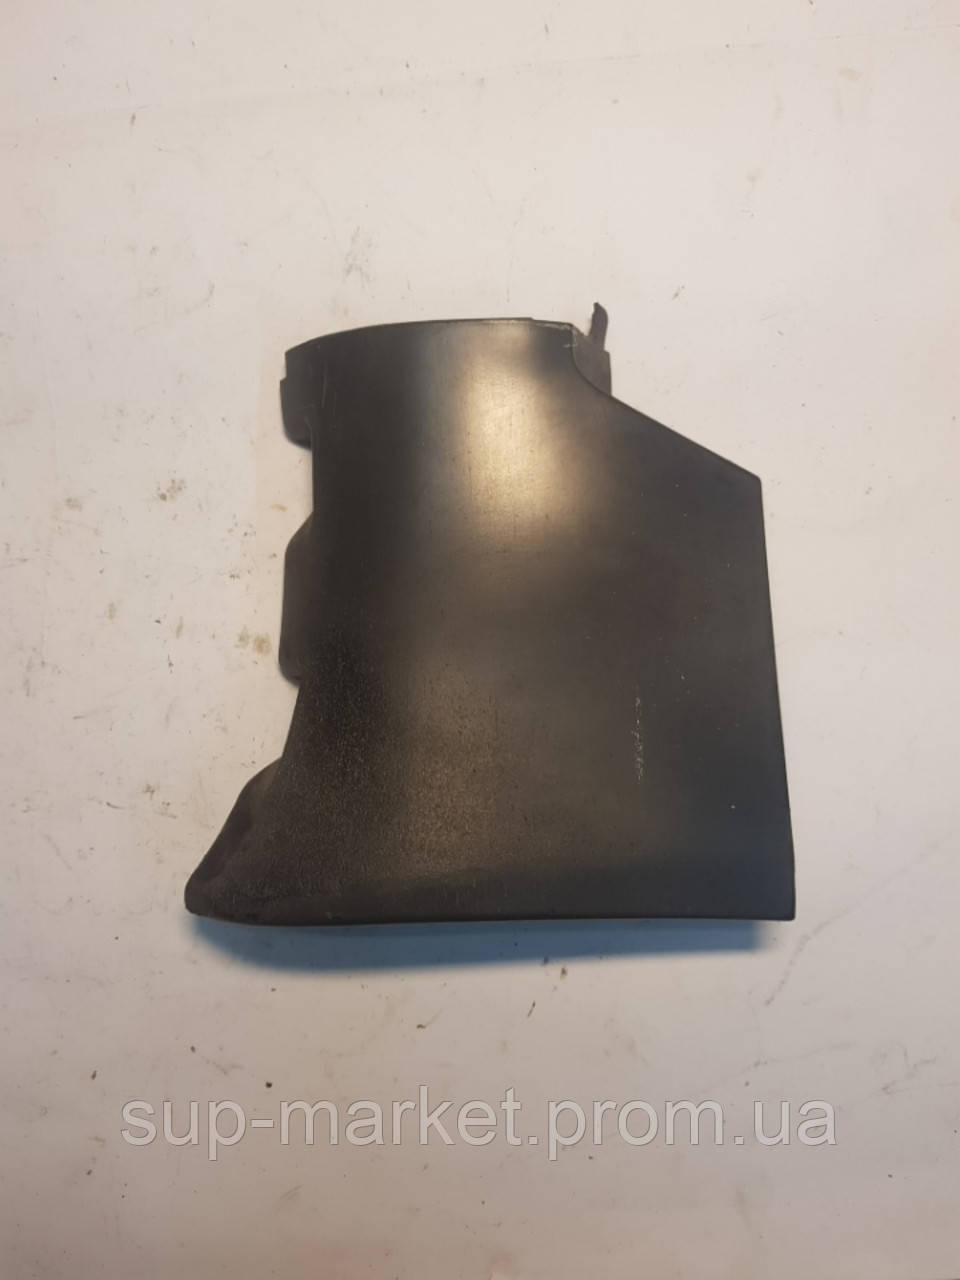 4B0853579 Накладка порога левая задняя  A6 C5 2.5TDI 1997-2004